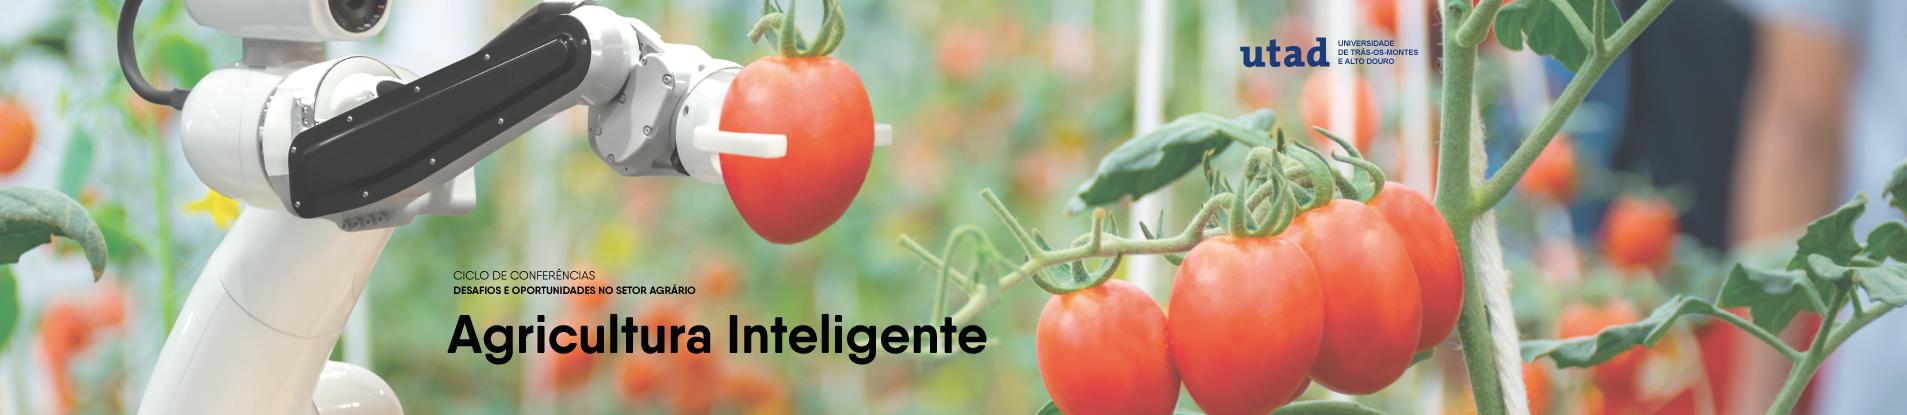 slider ciclo conferencias agrarias agricultura Inteligente